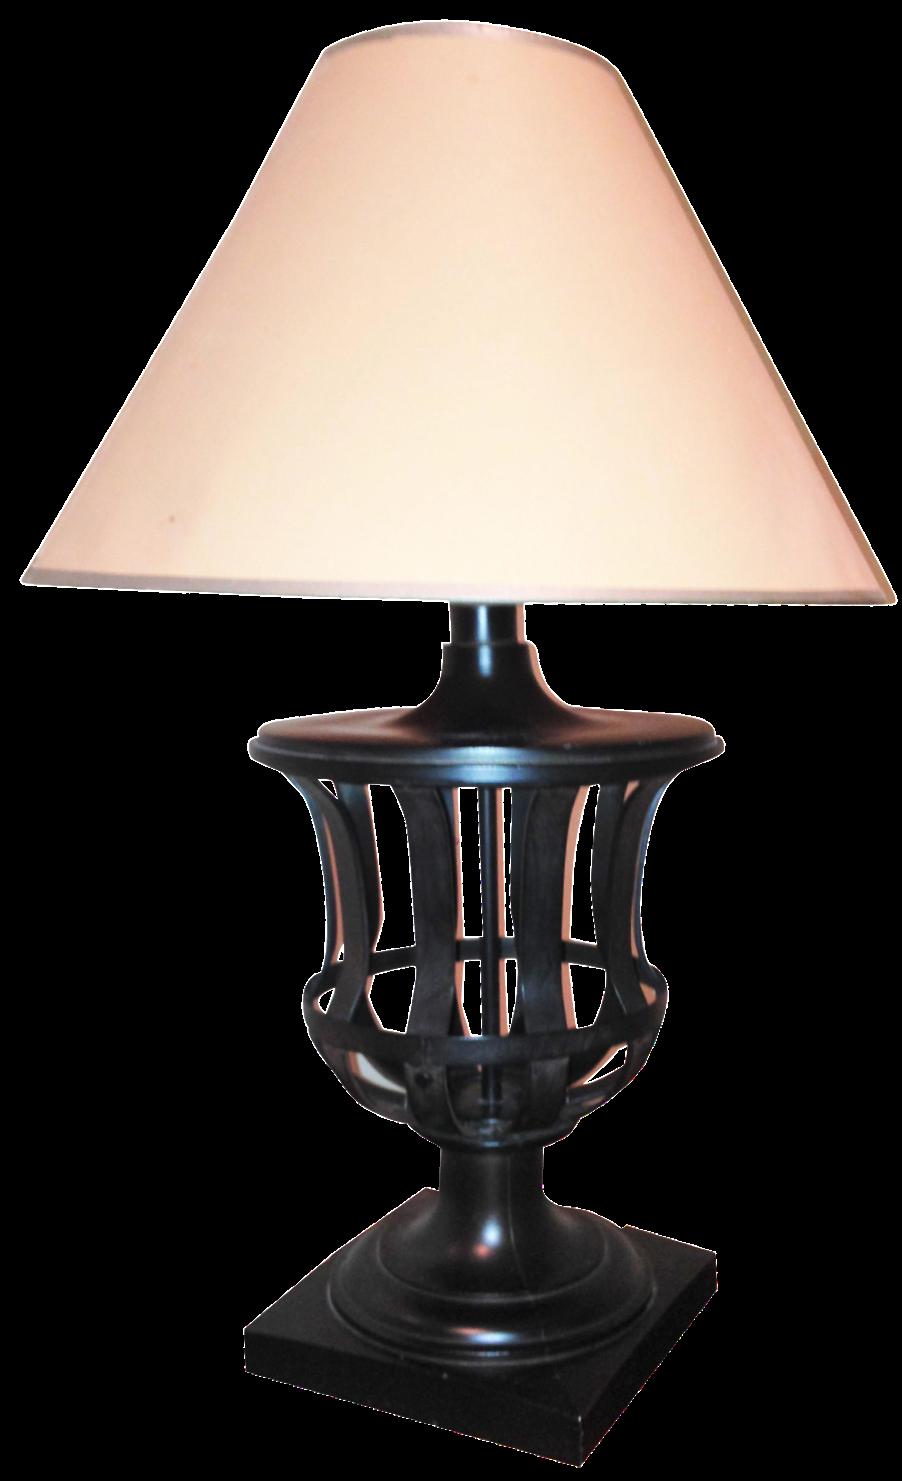 Restoration hardware table lamp chairish - Restoration hardware lamps table ...